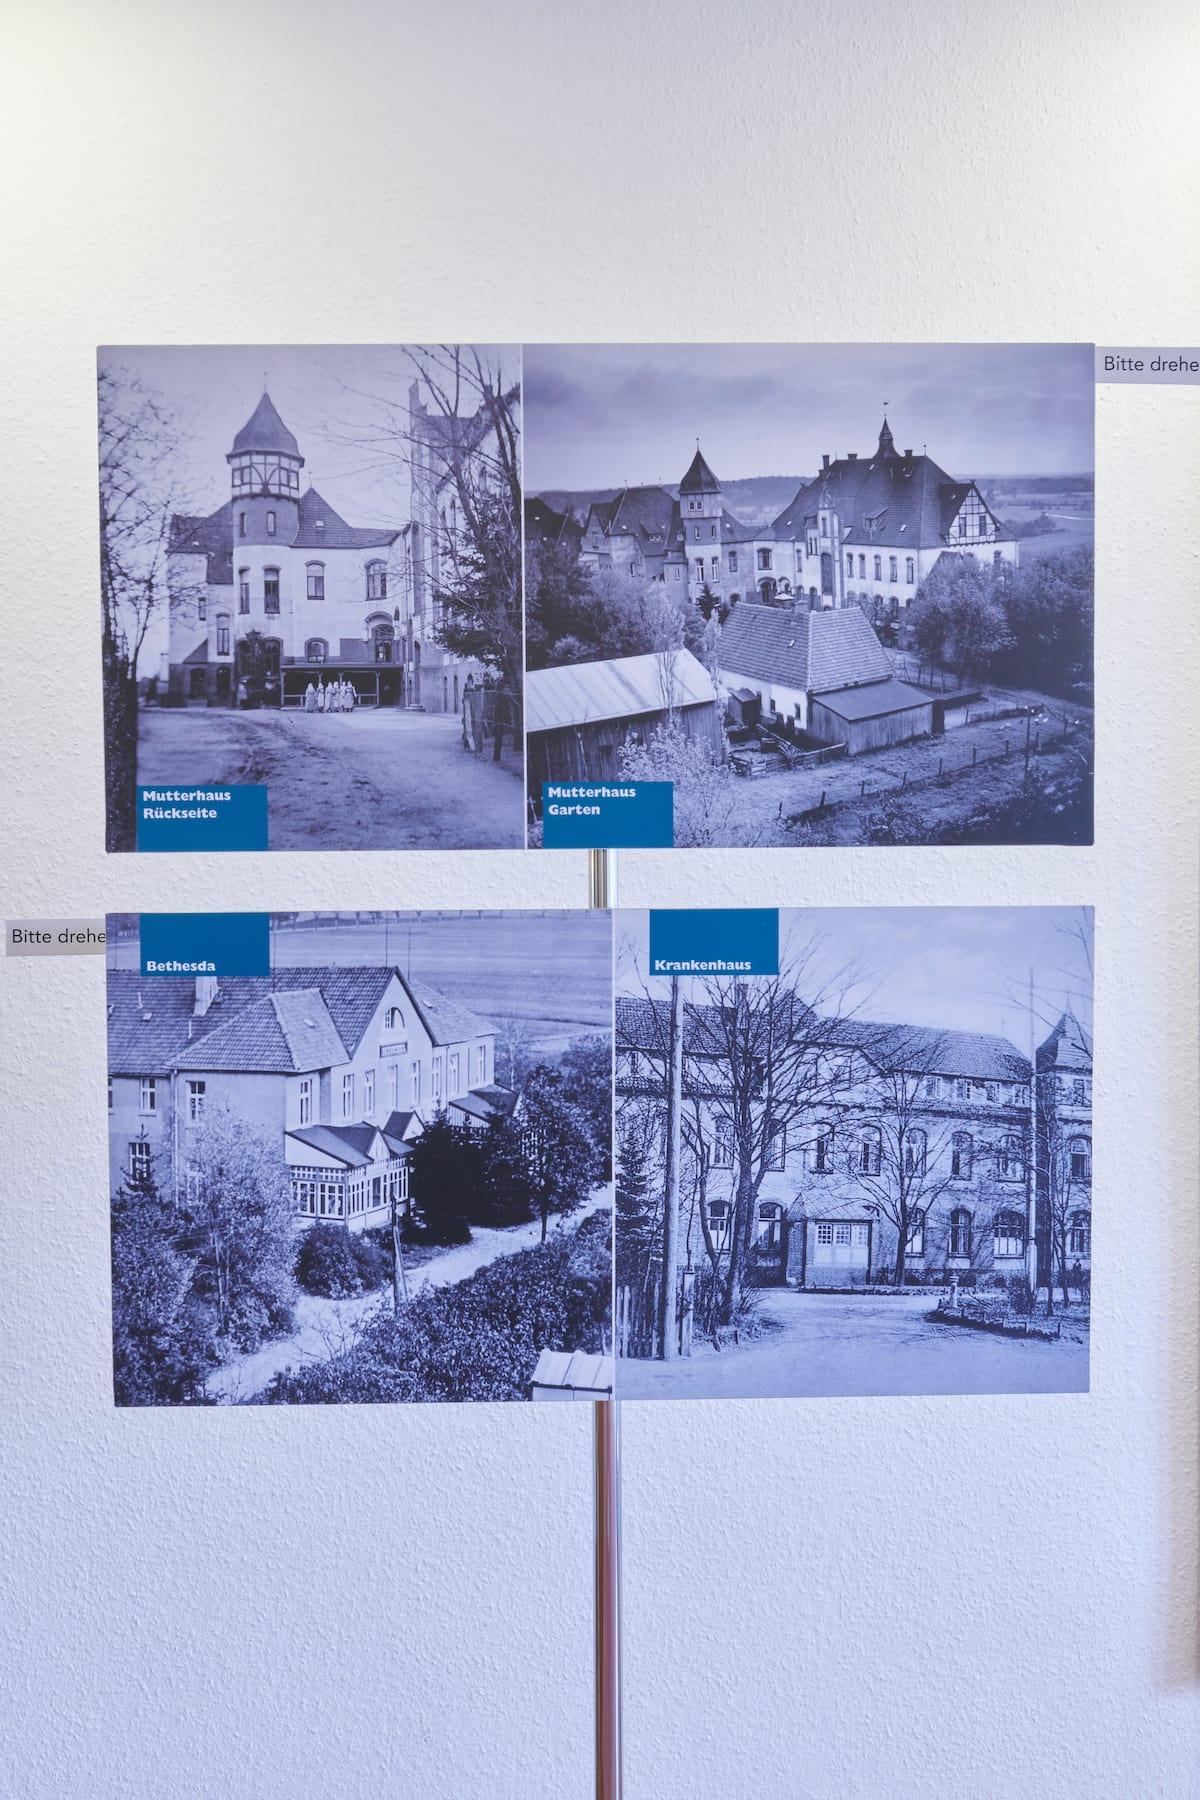 diakonissen-mutterhaus-rotenburg-geschichte-elise-averdieck-9